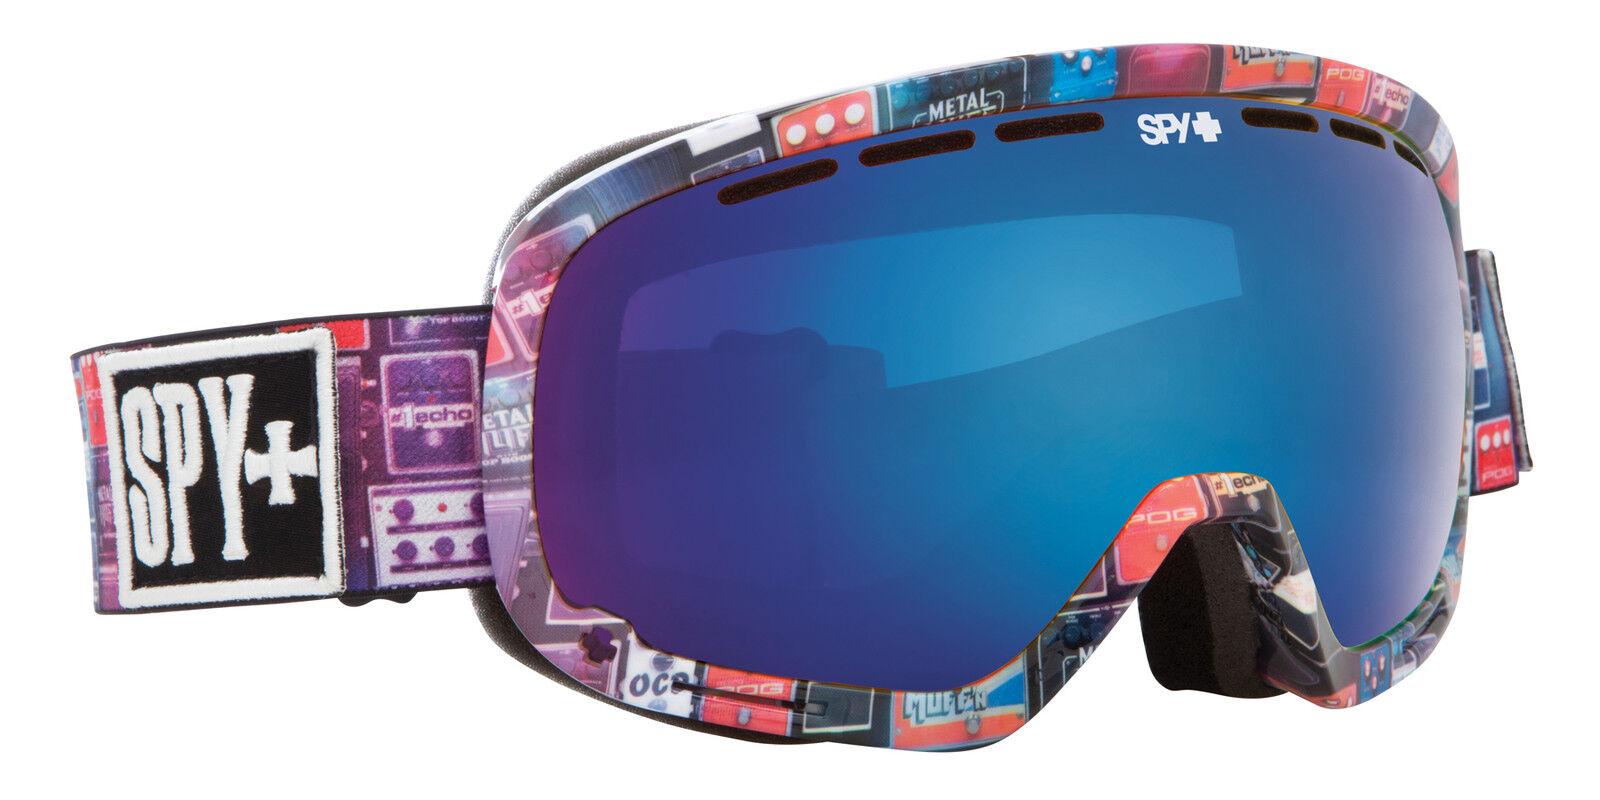 BRAND NEW IN BOX Spy Optic MARSHALL VOLUME 11 Snowboard Ski Goggle PERSIMMON